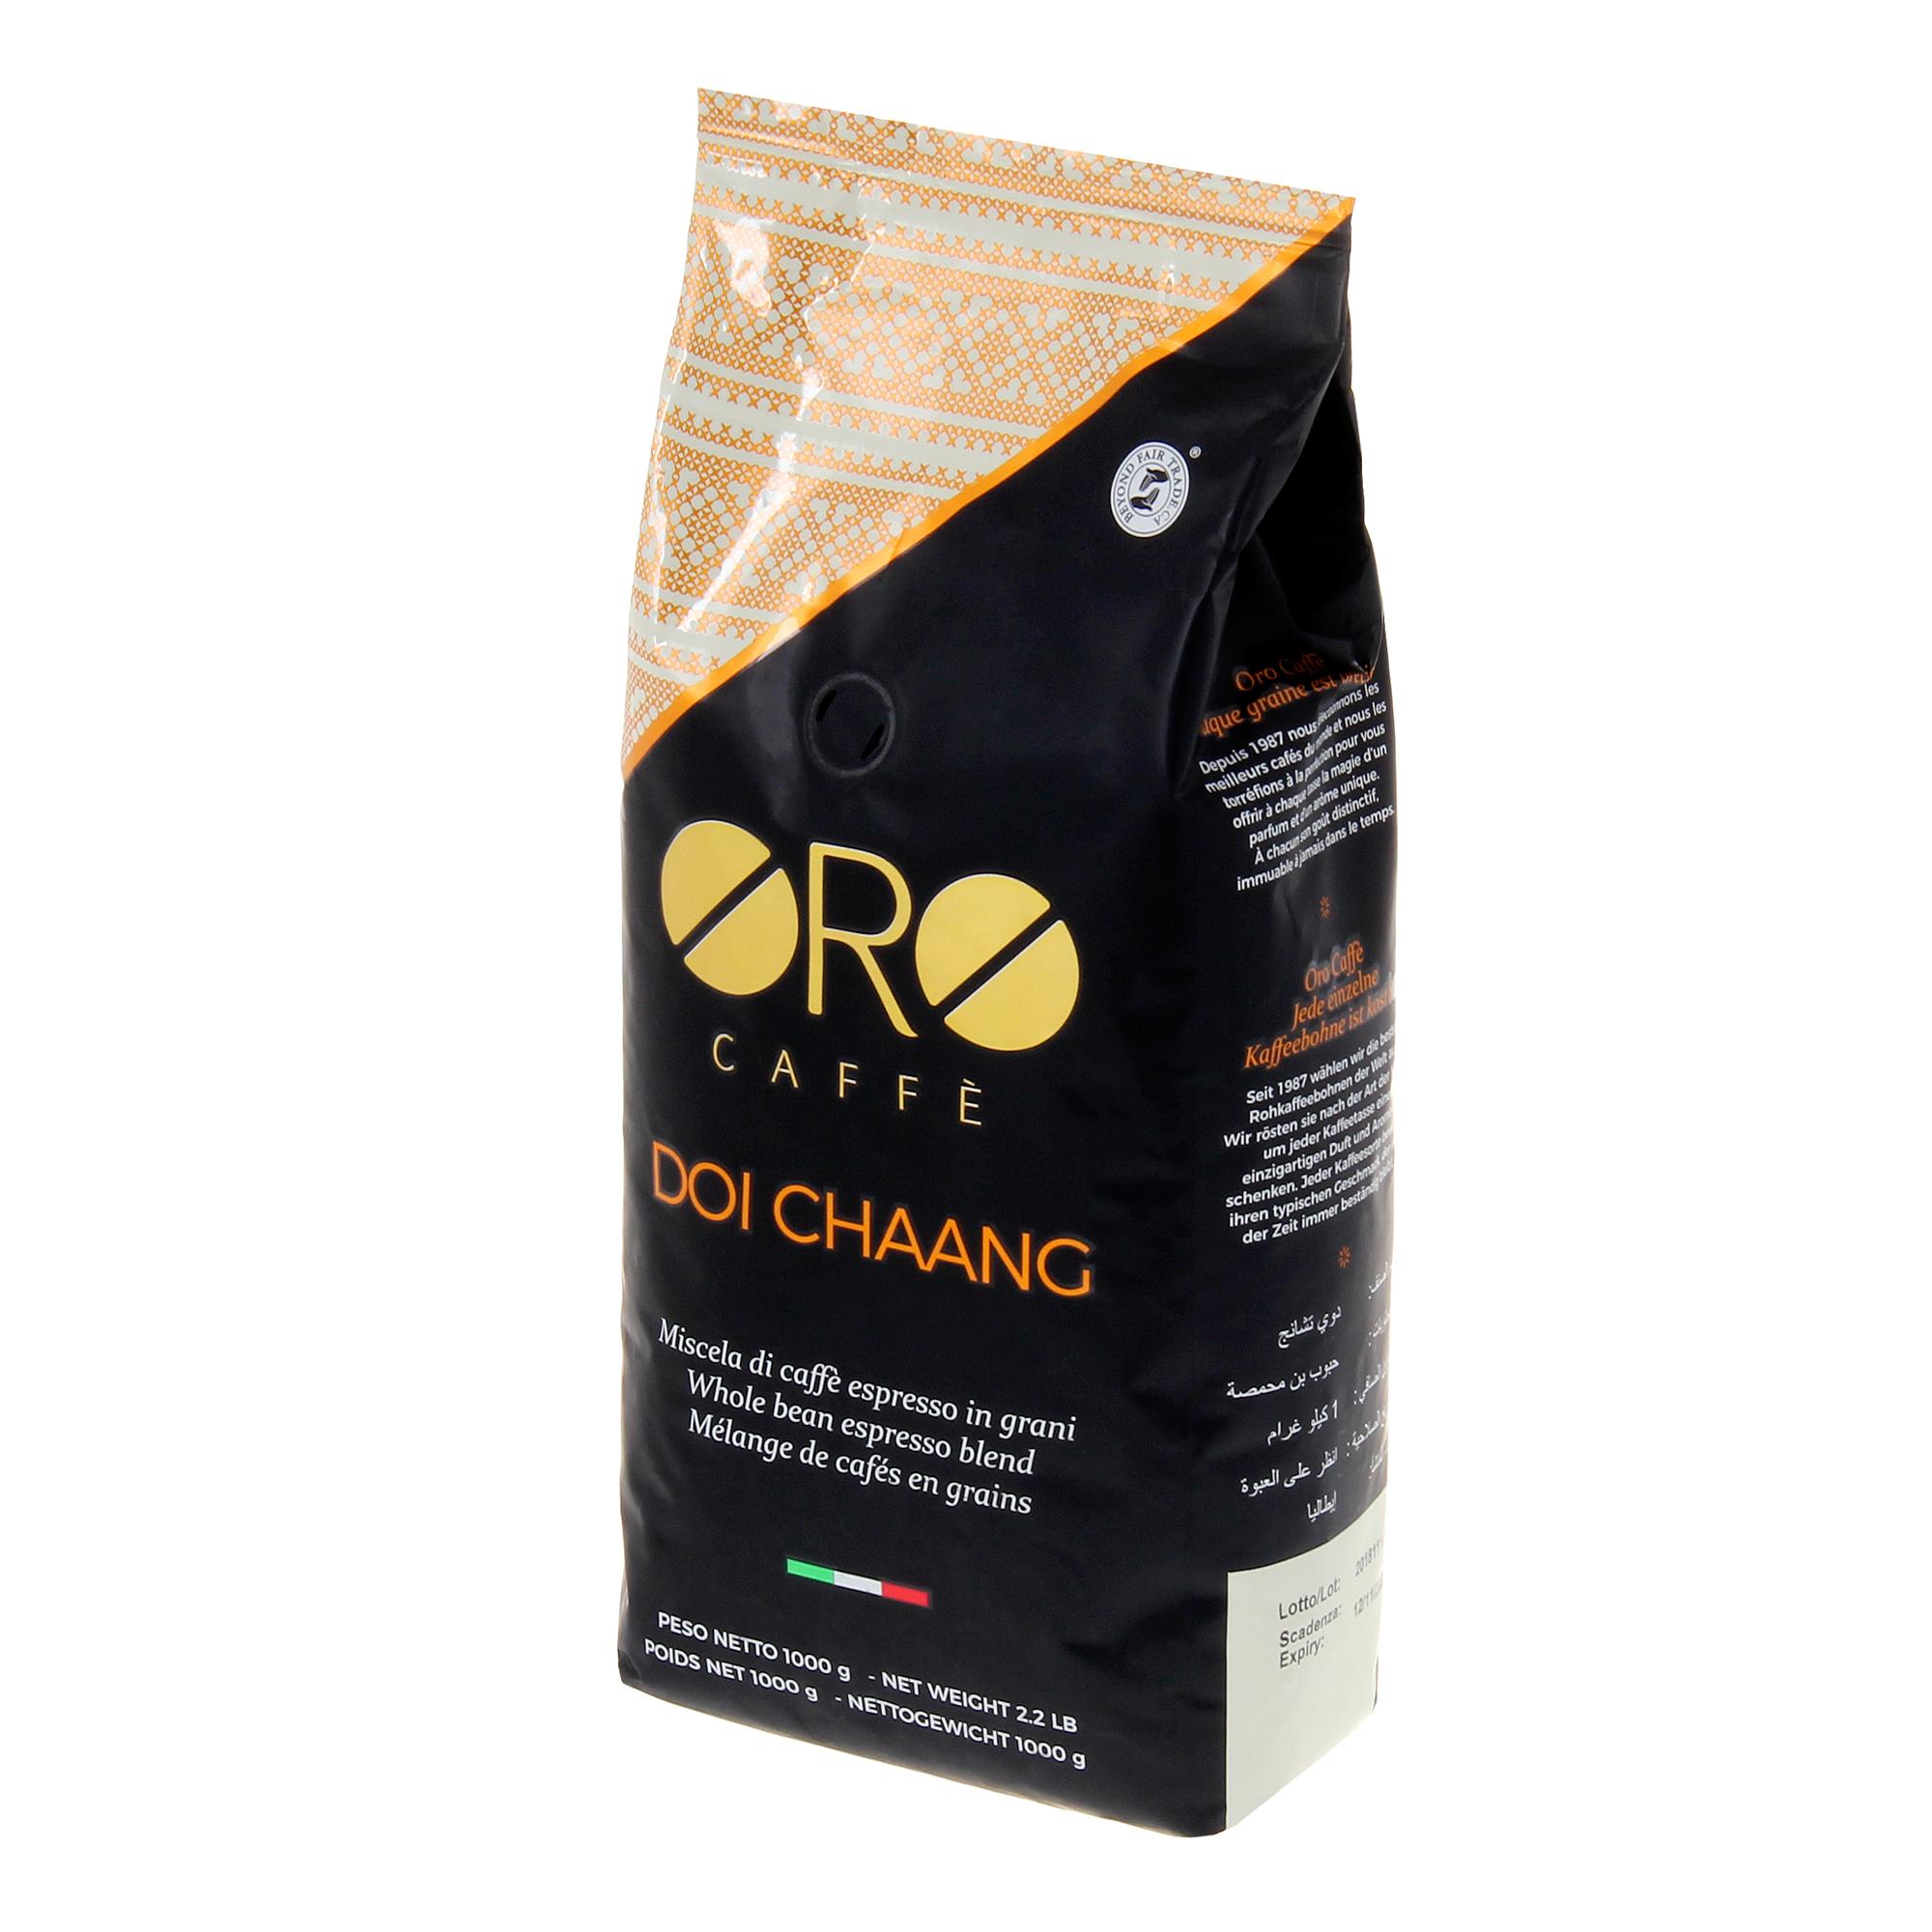 Кофе в зернах Oro Caffe Doi Chaang 1 кг кофе в зернах oro caffe cremoso 1 кг